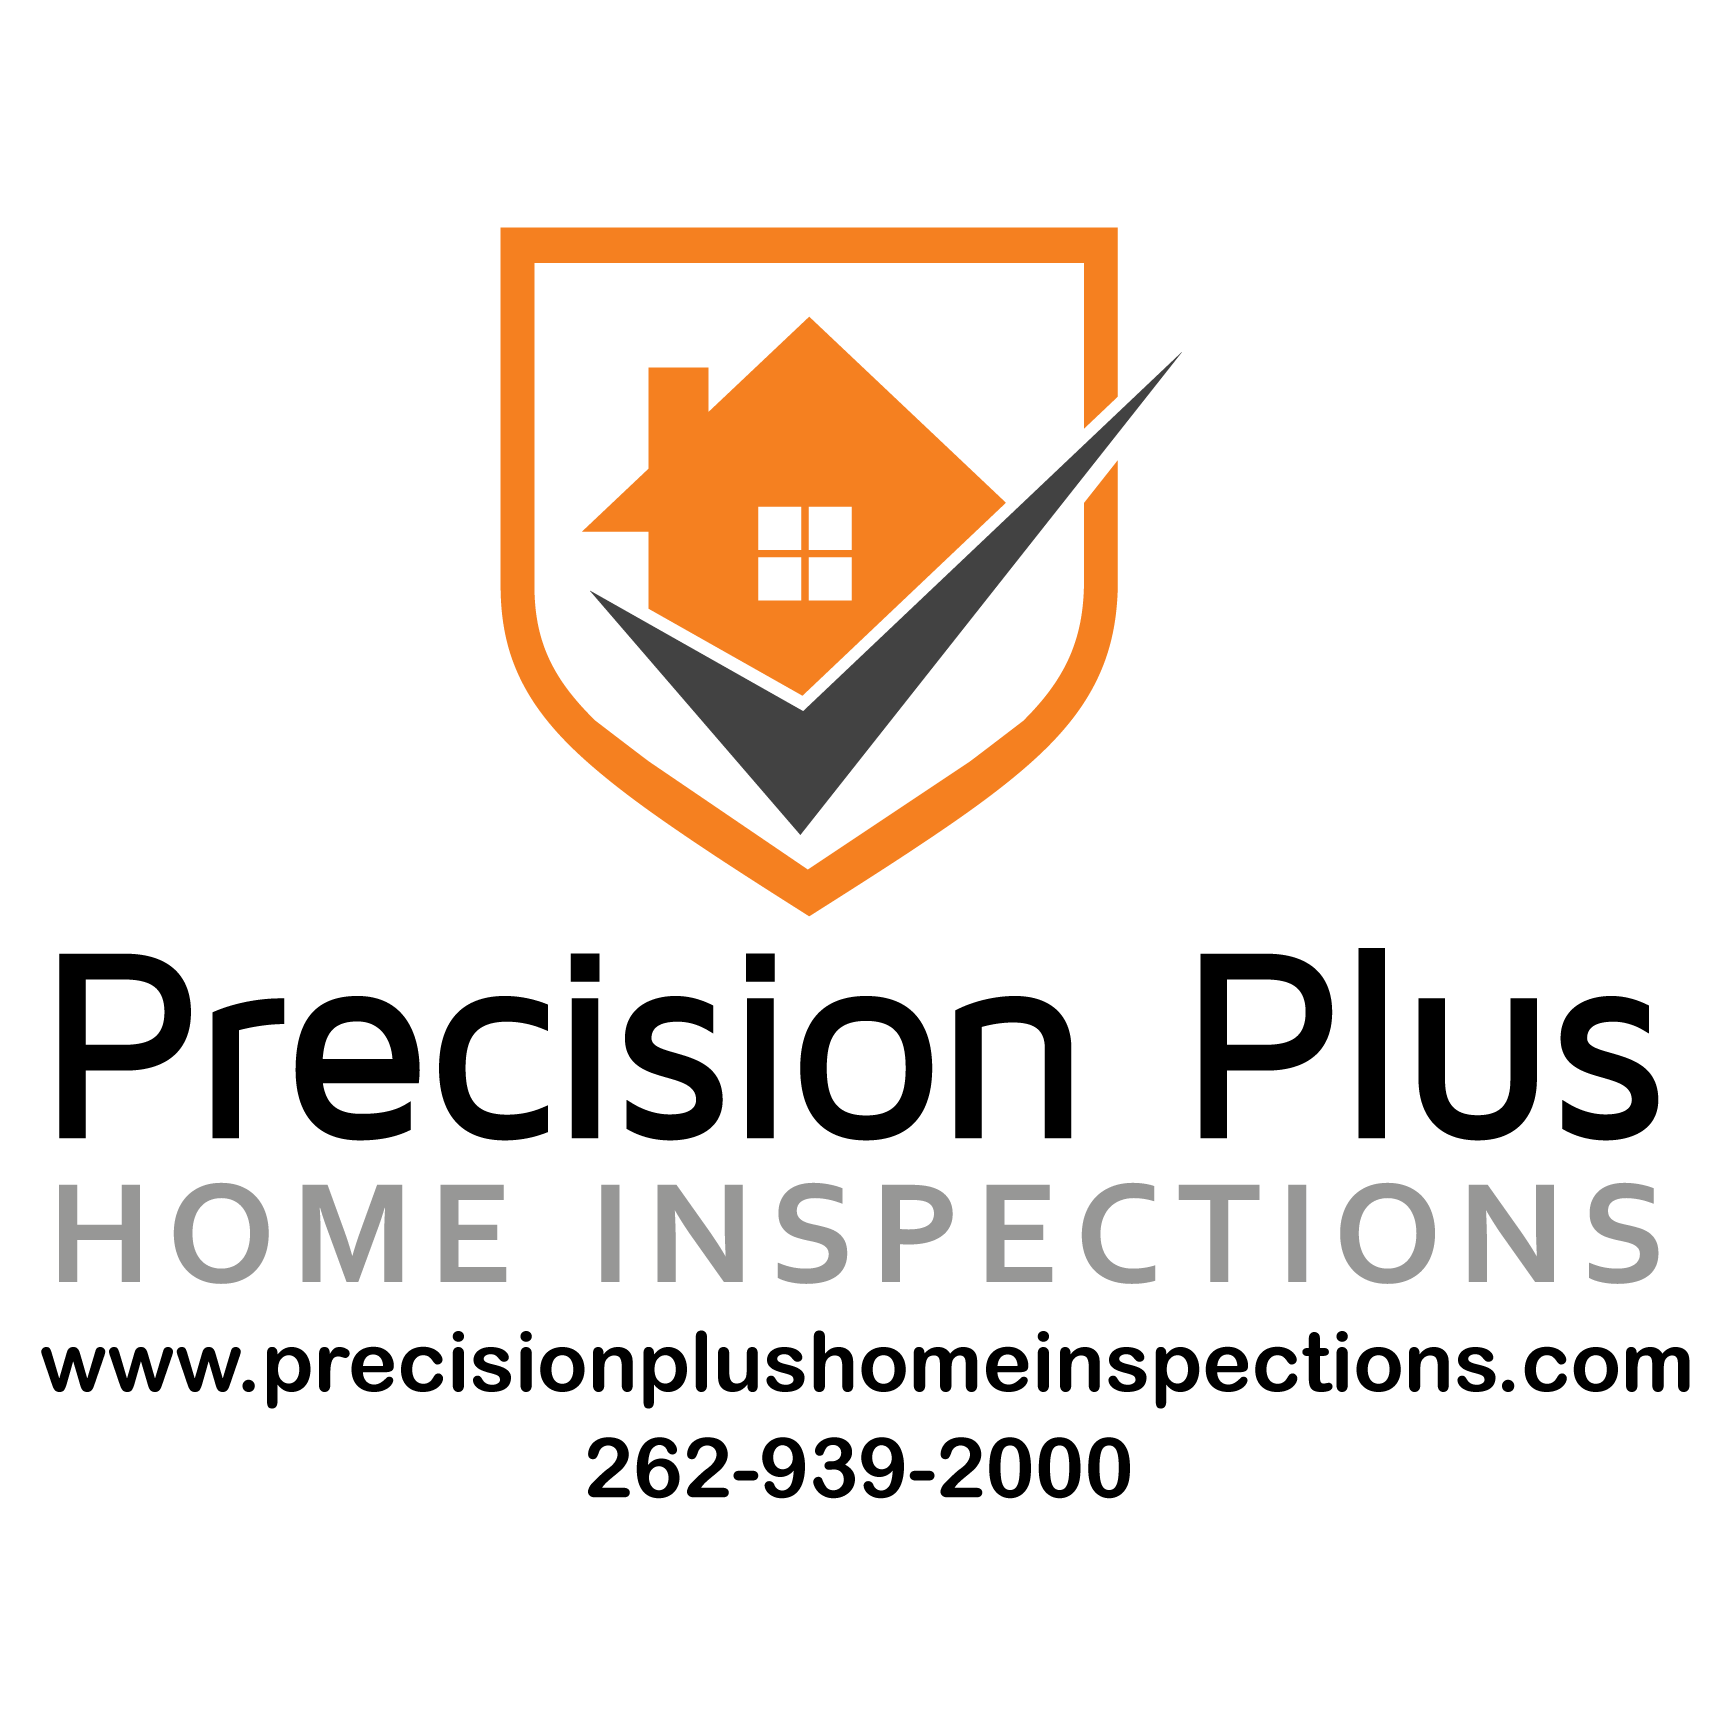 Precision Plus Home Inspections Llc